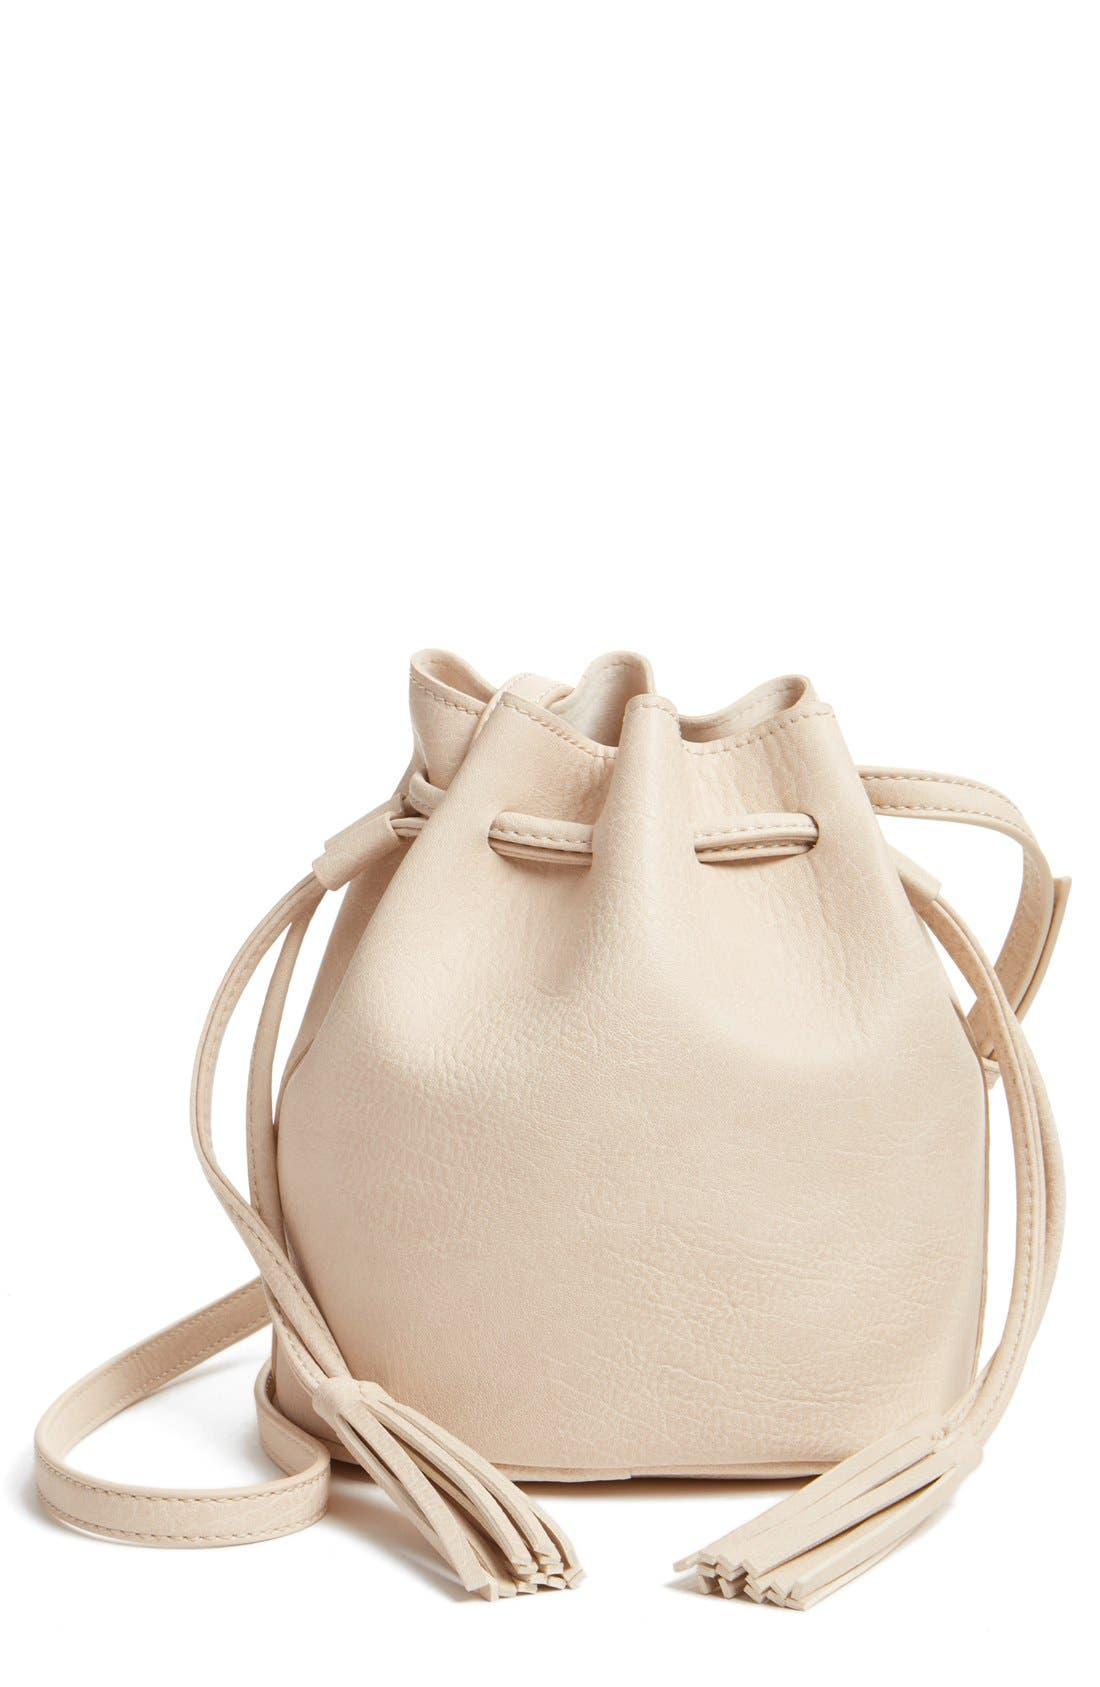 Main Image - Street Level Mini Faux Leather Tassel Bucket Bag